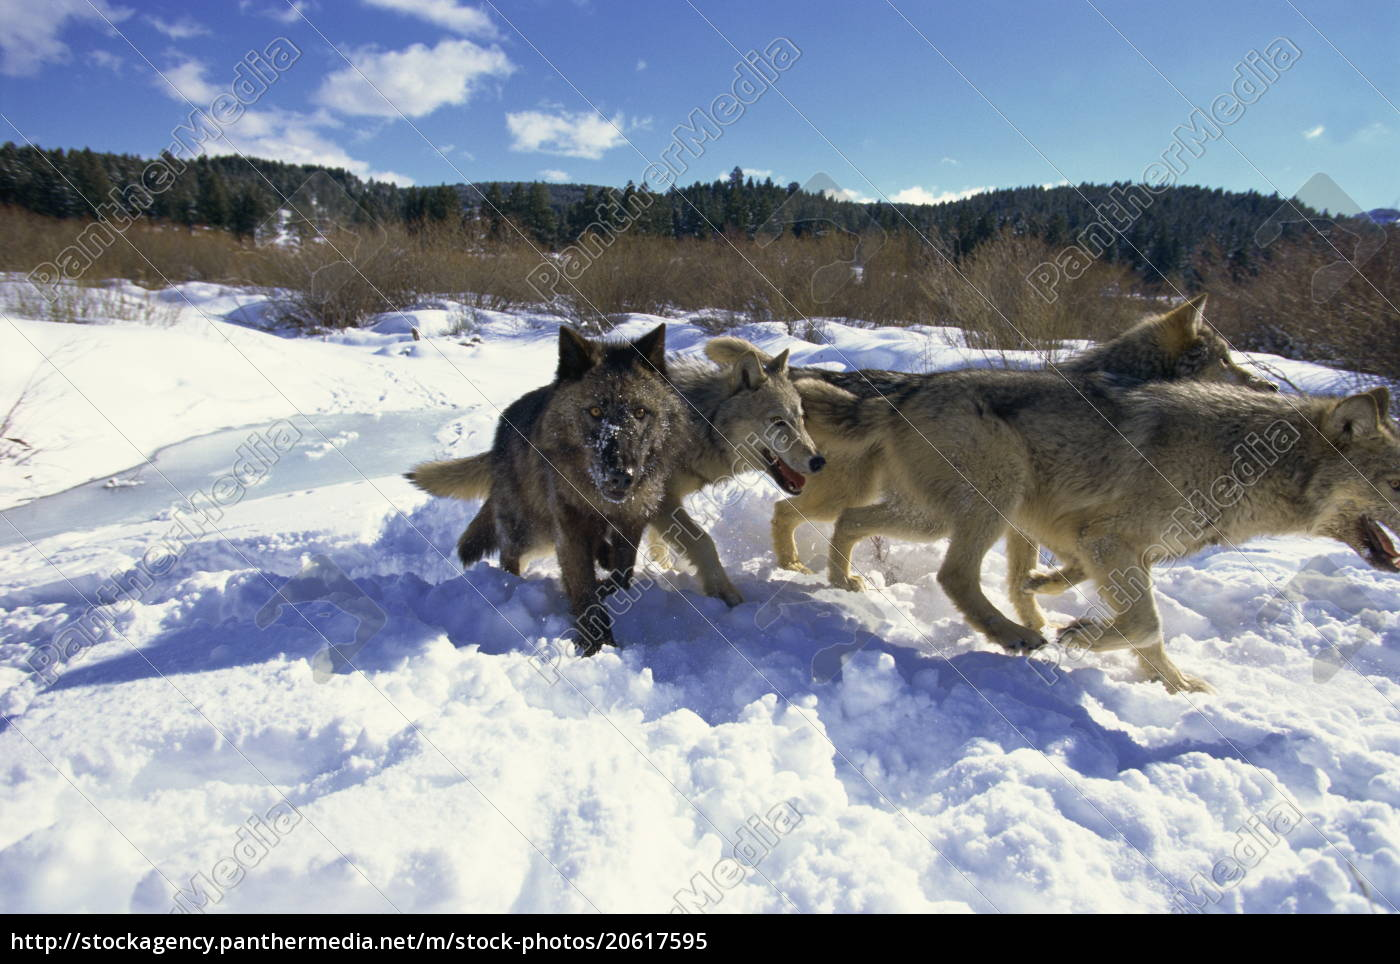 wölfe, (canis, lupis), animals, of, montana, montana, vereinigte, staaten - 20617595